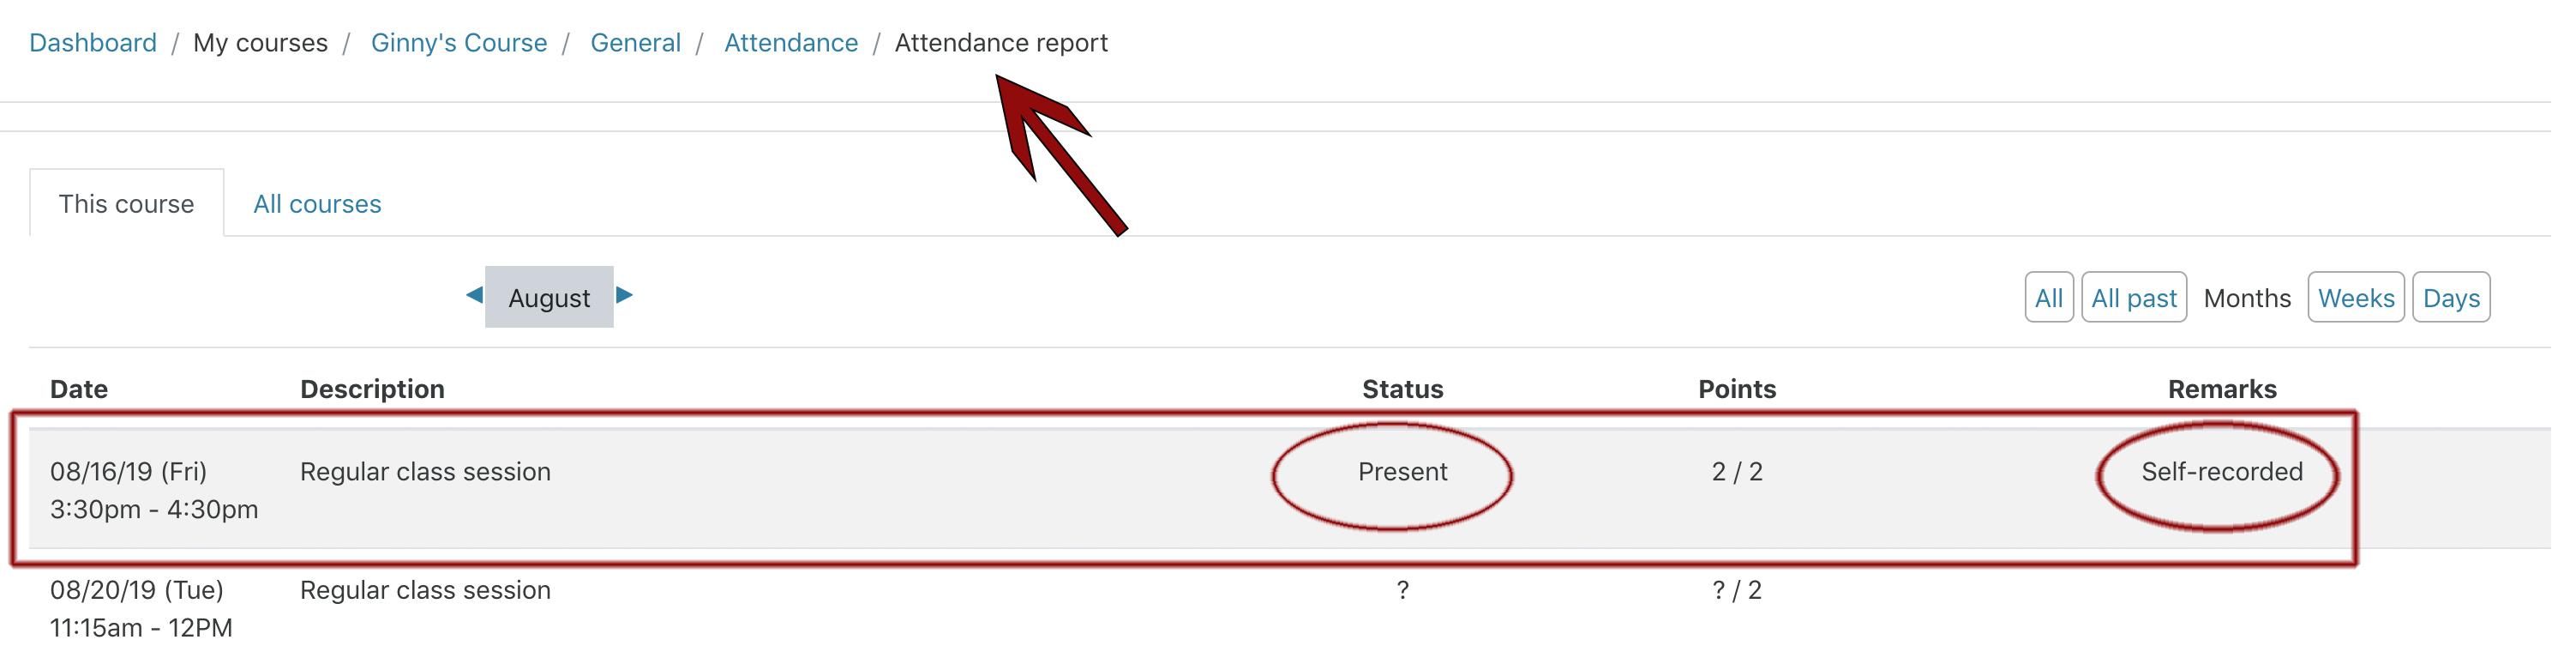 Image: Nexus student attendance report